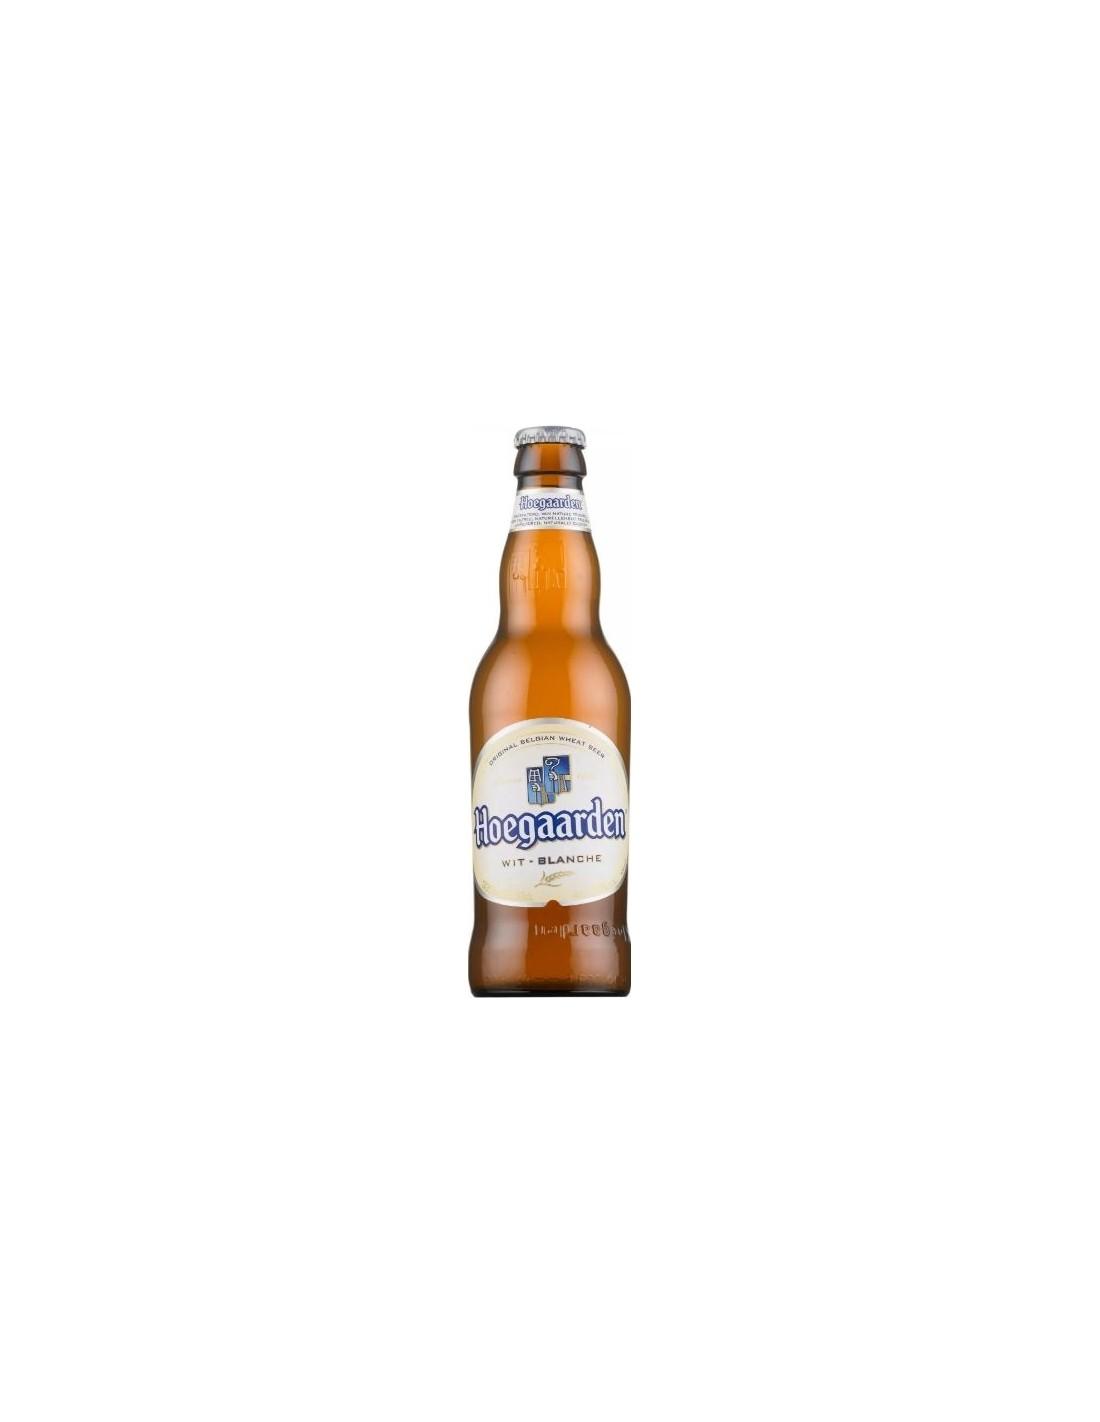 Bere blonda Hoegaarden, 4.9% alc., 0.25L, Belgia